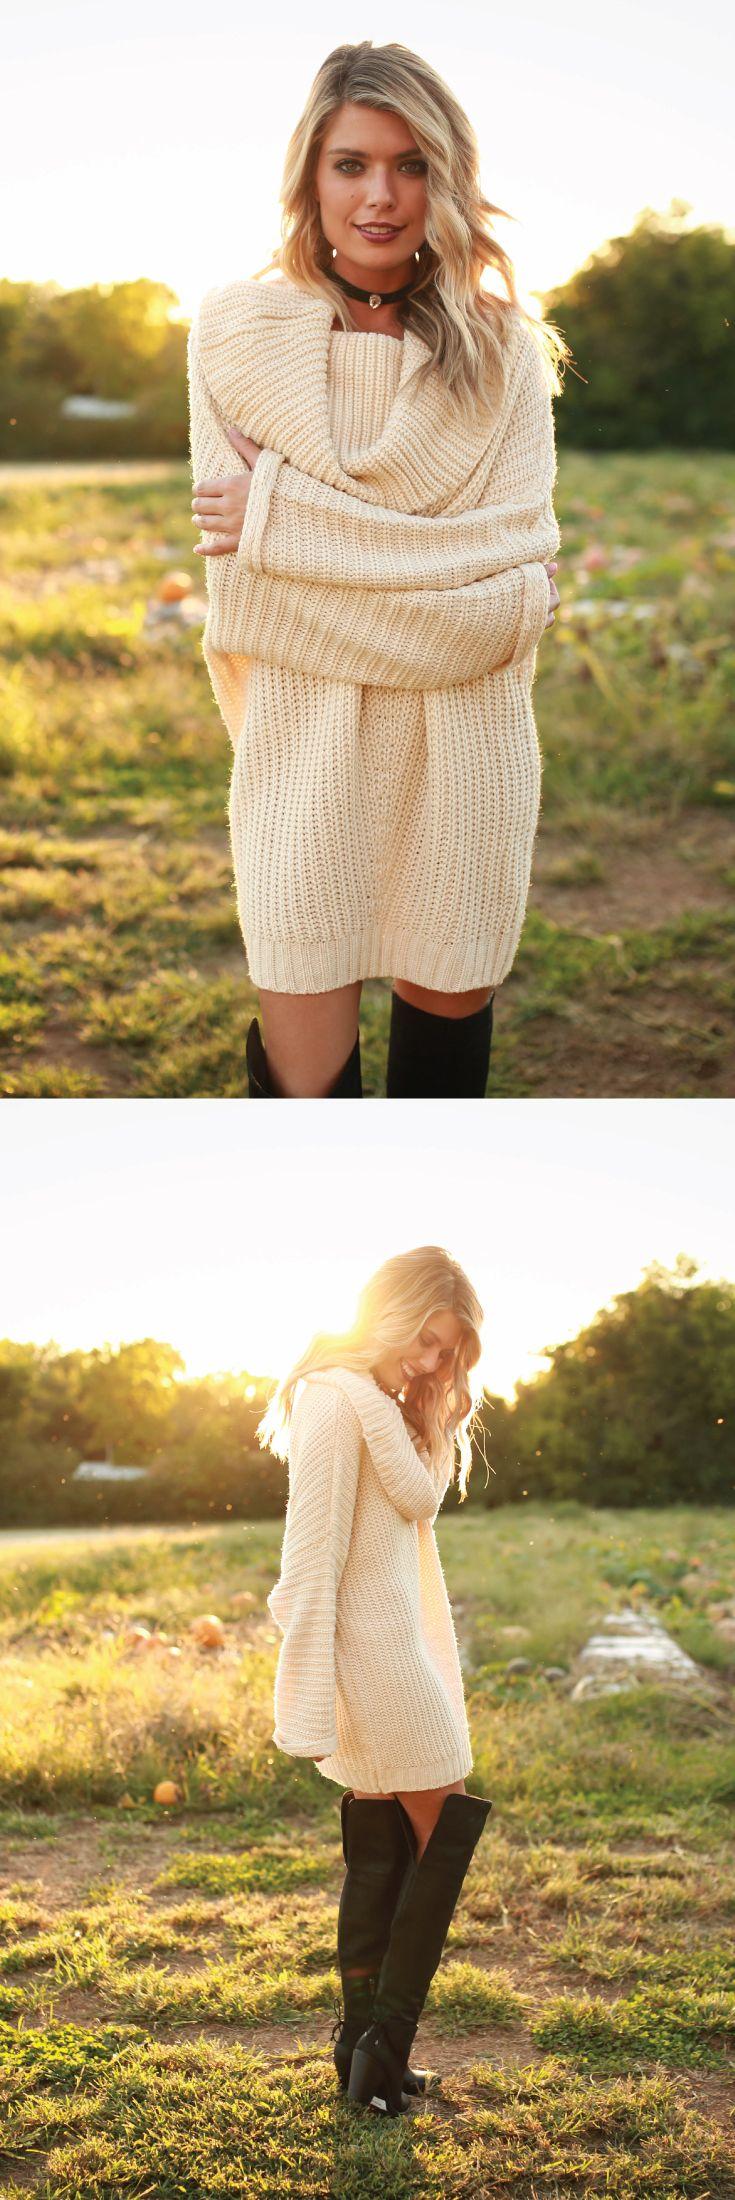 1846ad246d4552a11e9a296b3eb6e06c  big comfy sweaters oversized knit sweaters